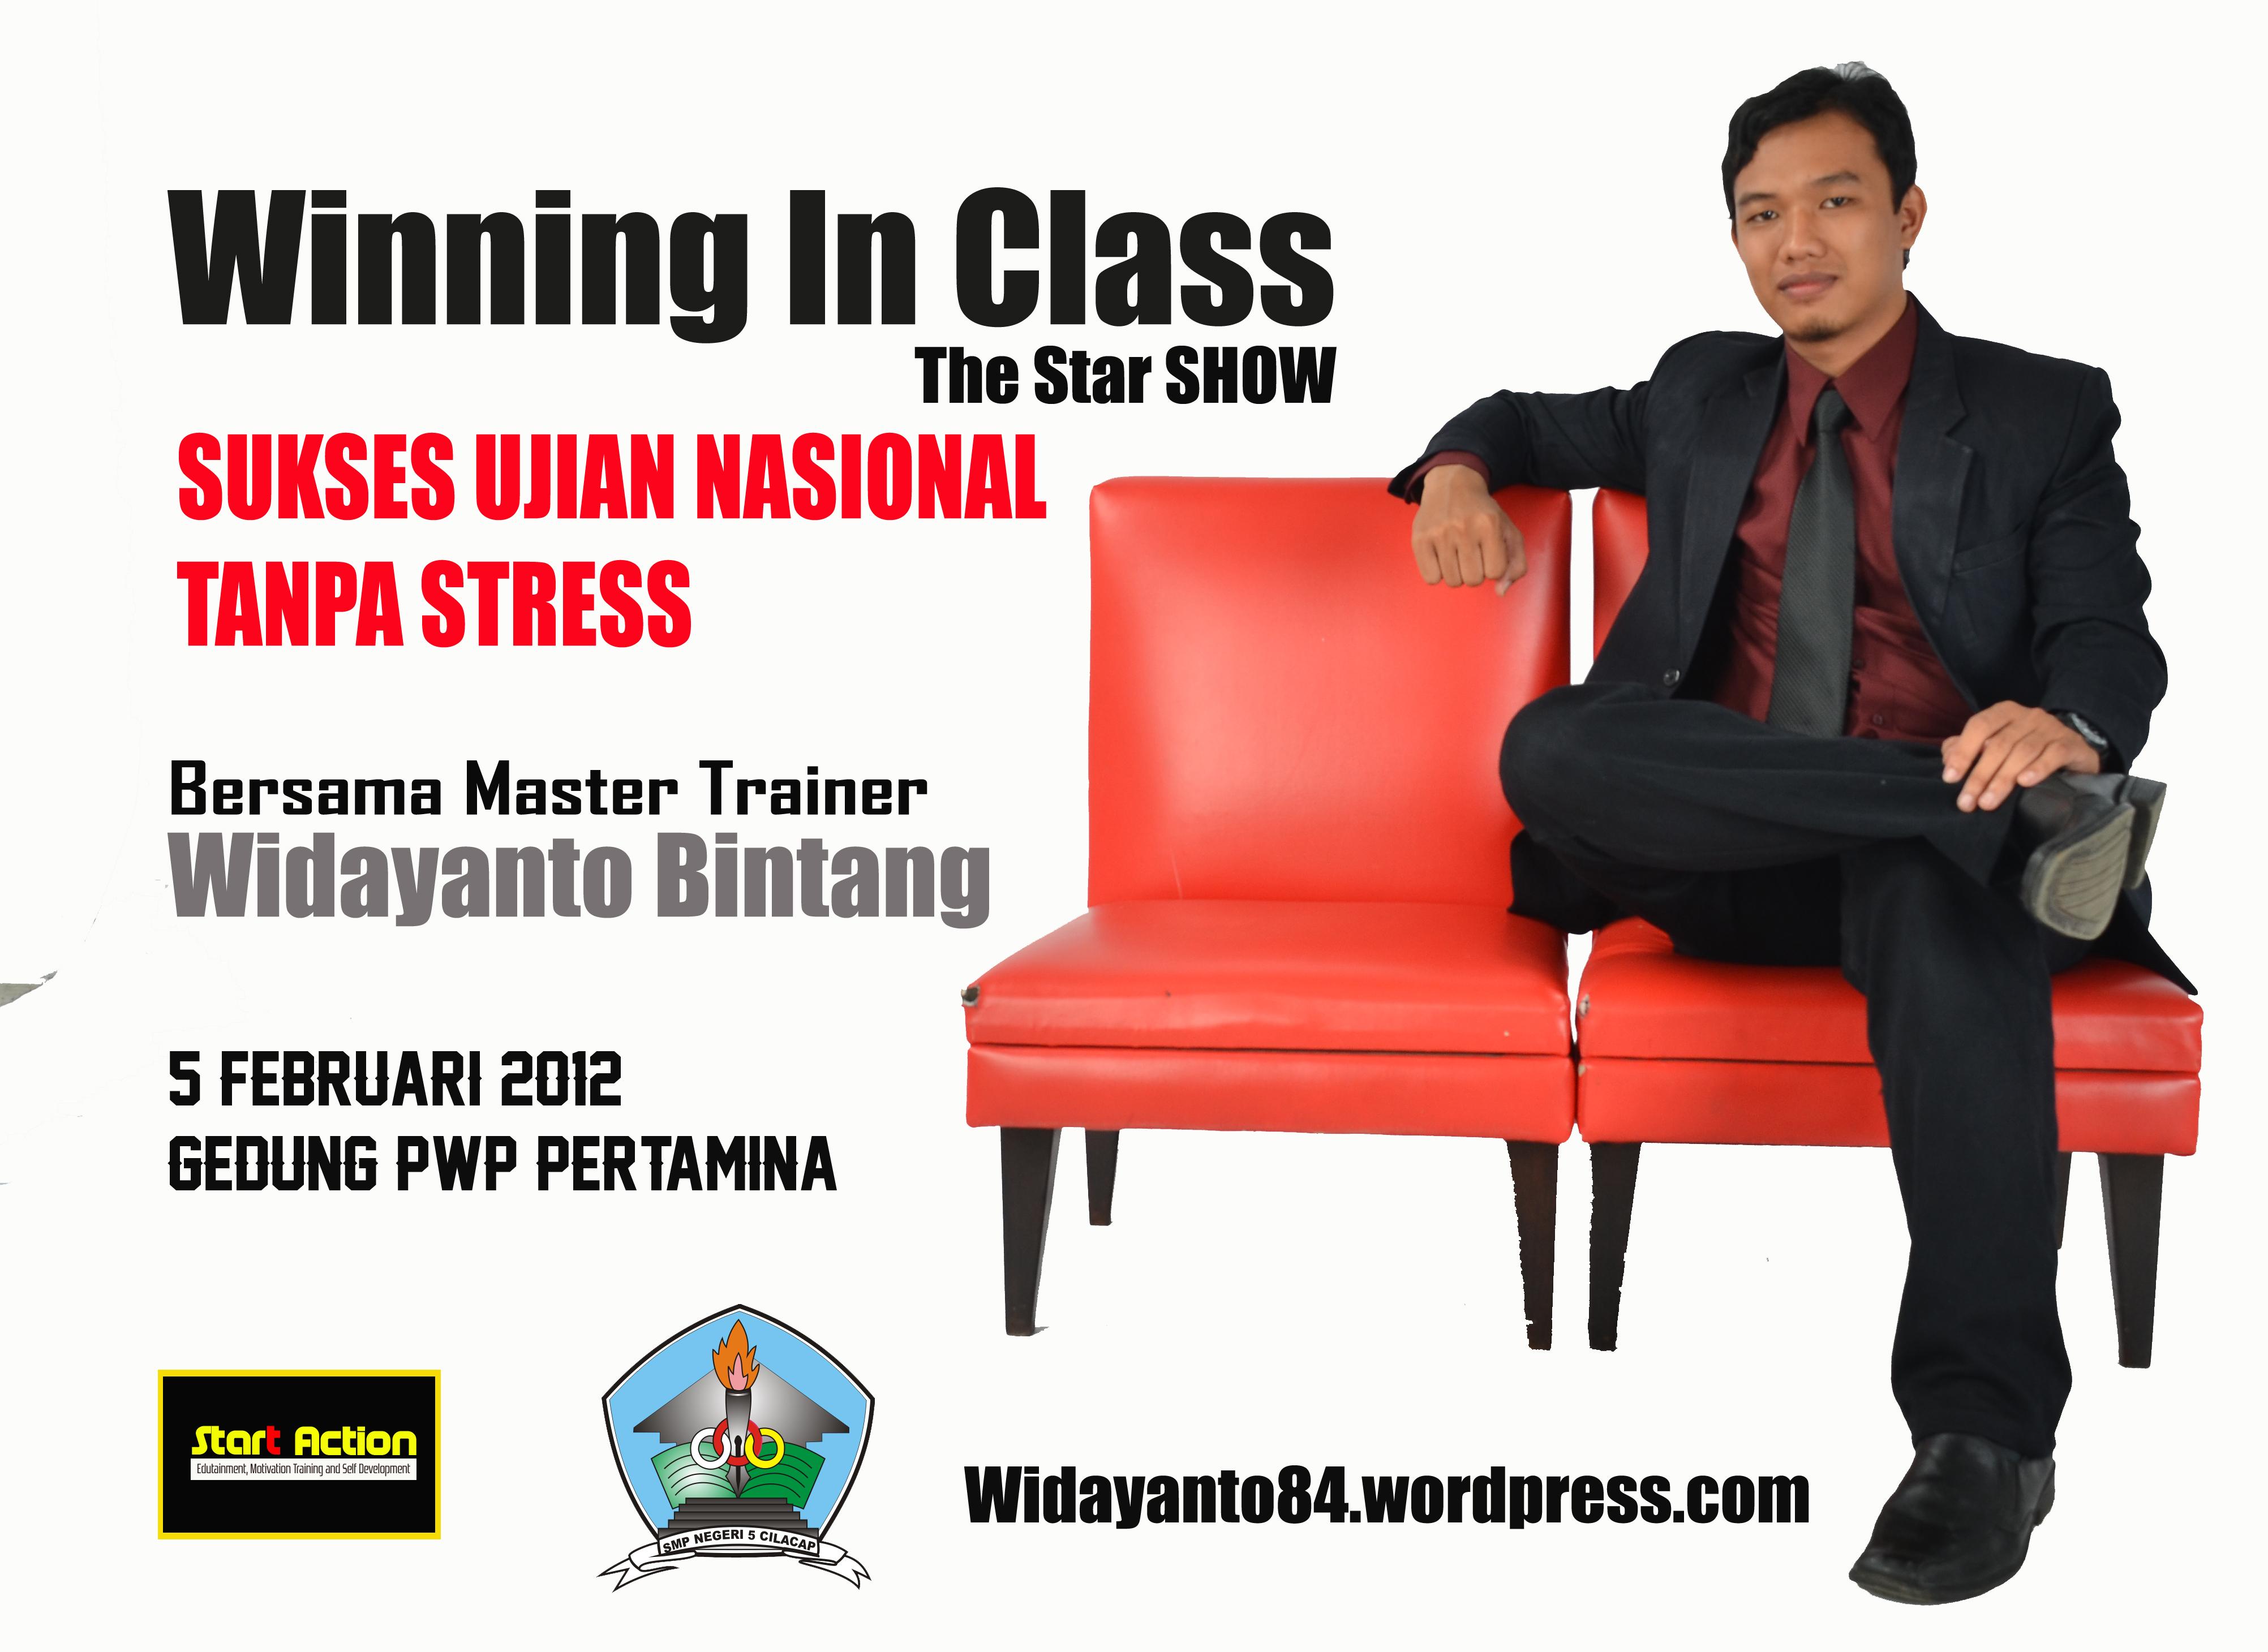 Seminar Motivasi Sukses Ujian Nasional The Way To Winning In Class